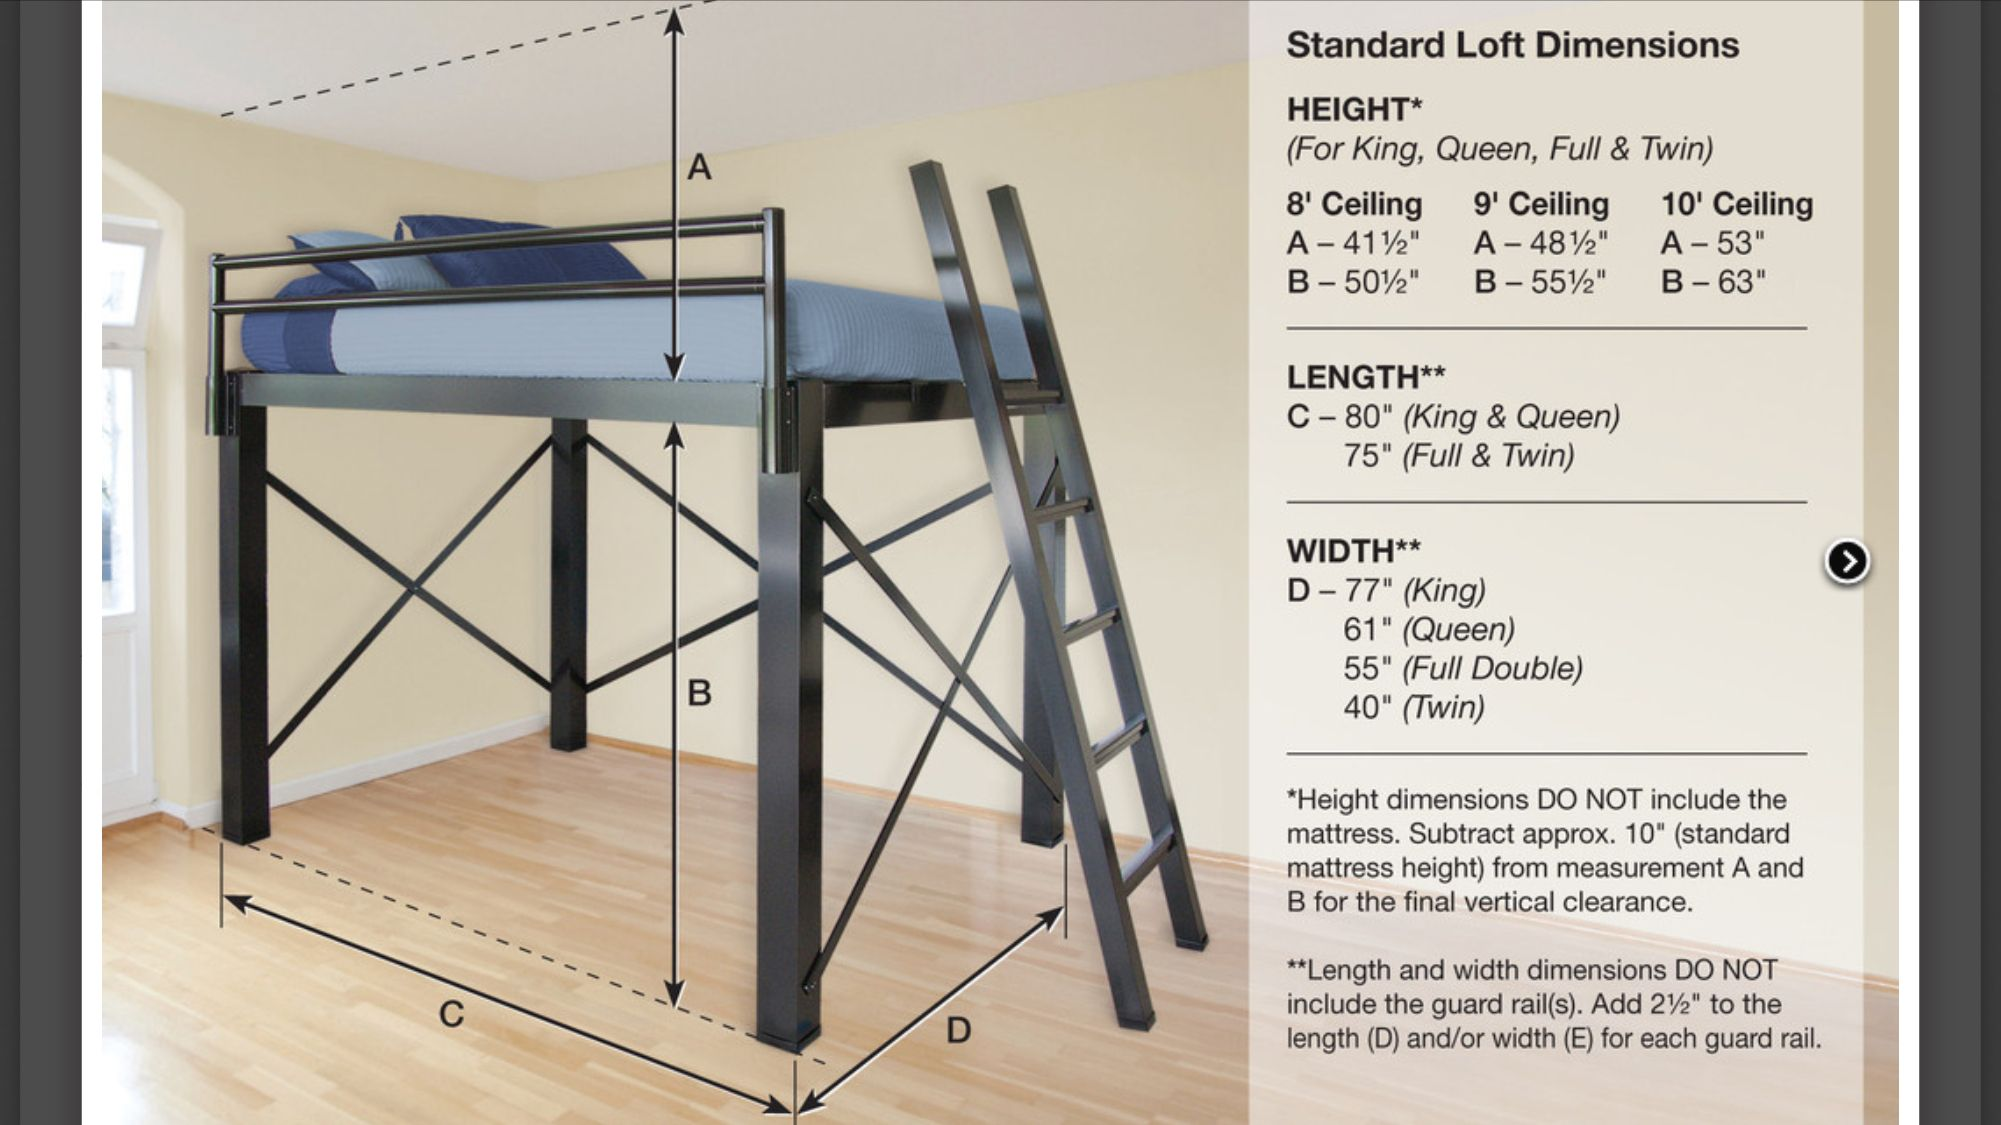 Loft Beds For Adults Adult Loft Bed Queen Loft Beds Loft Bed Frame